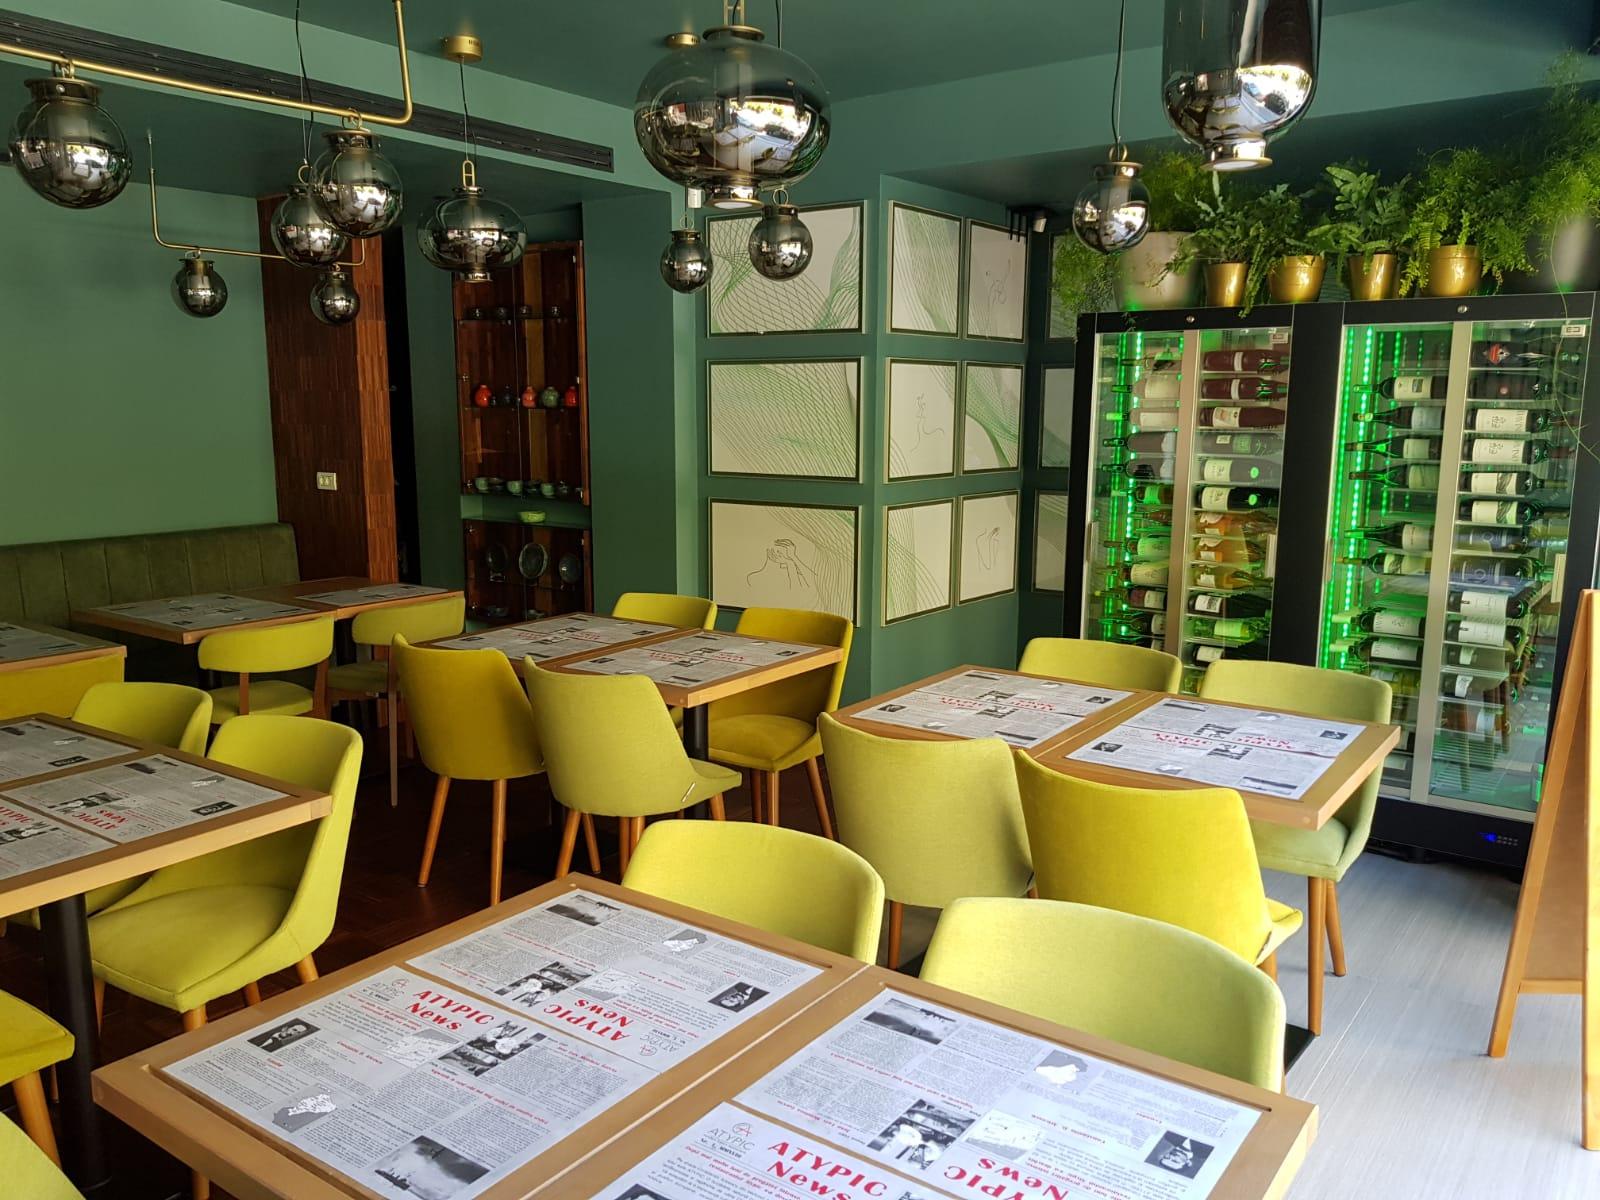 Restaurant Atypic: Bao cu 3 tipuri de chilli?